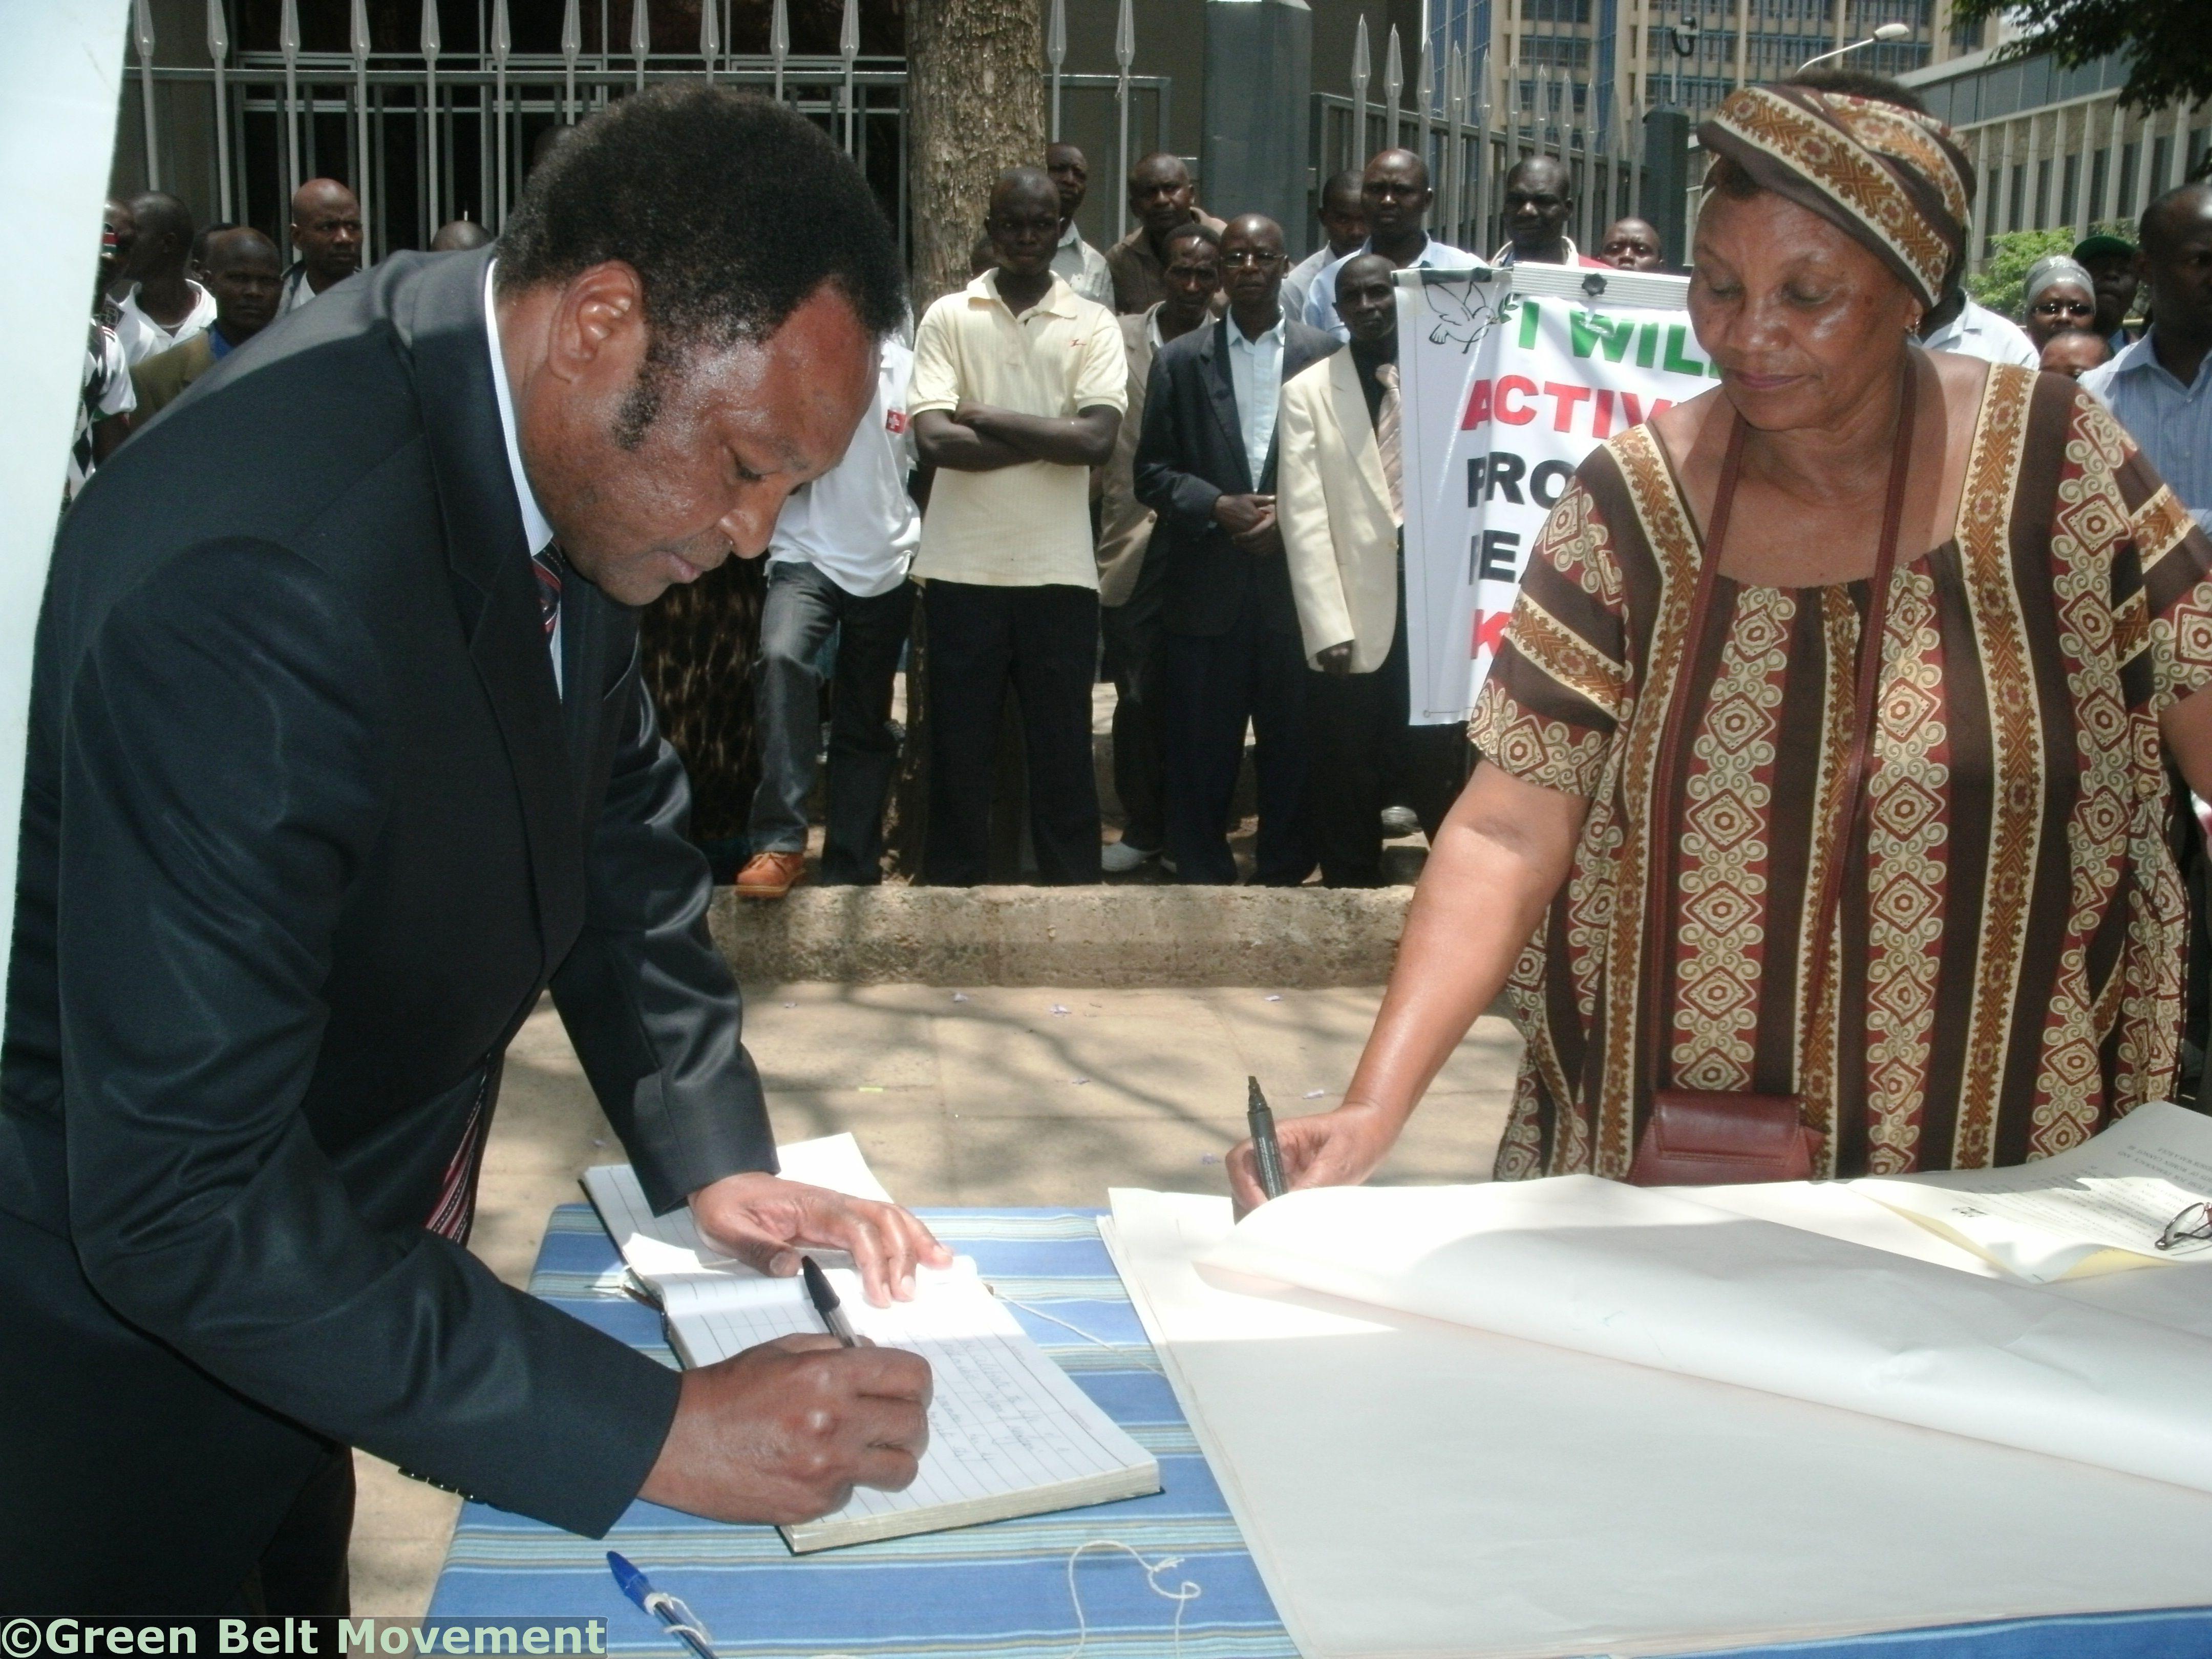 Provincial Commissioner for Nairobi, Mr. Njoroge Ndirangu, signs the pledge book.